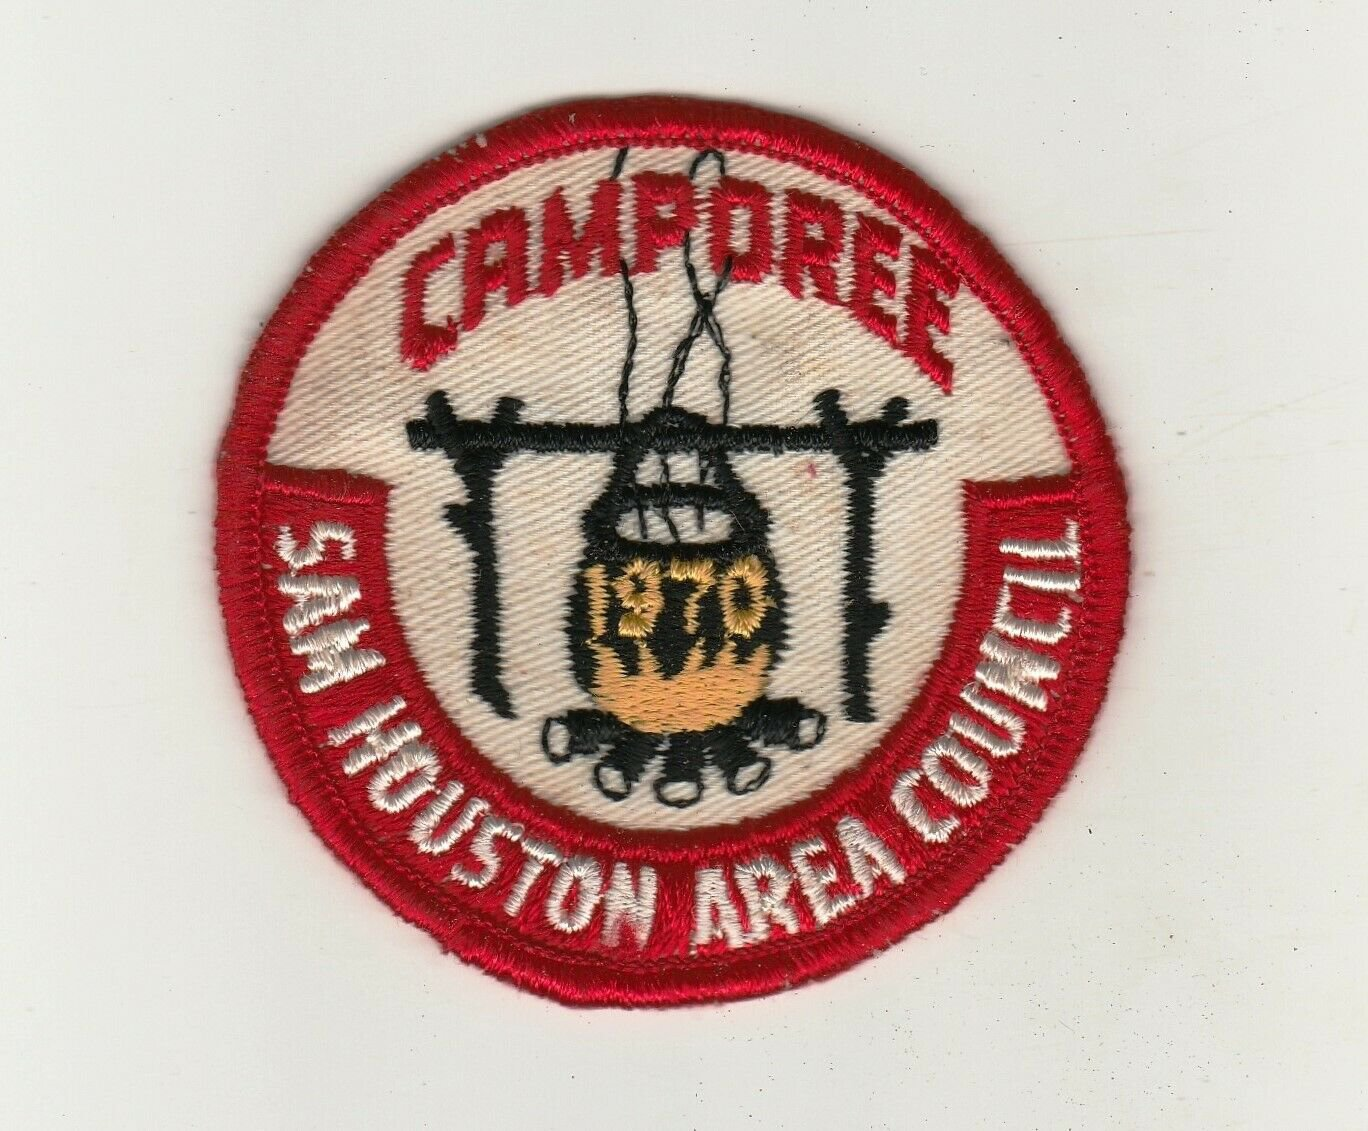 BSA 1970 Sam Houston Area Council Camporee patch